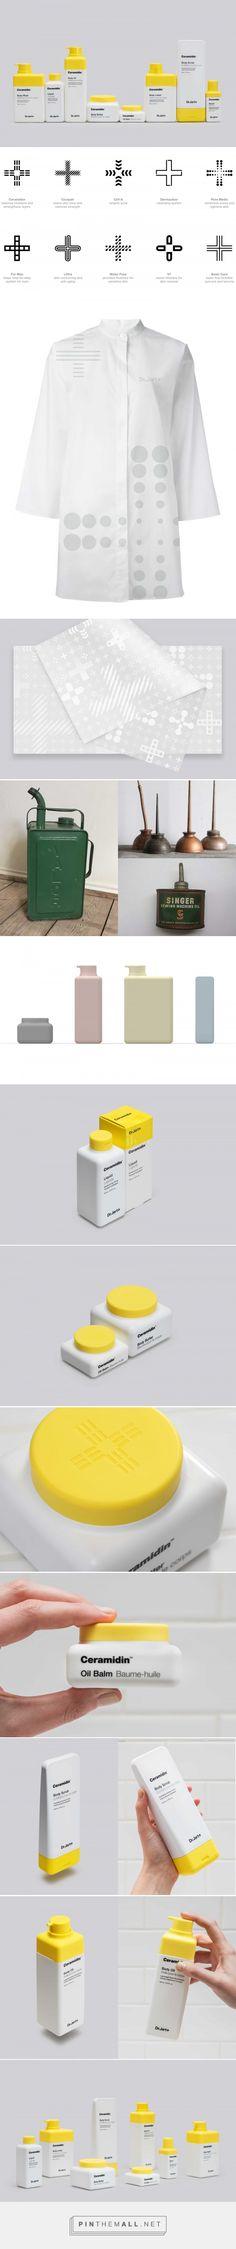 Dr. Jart+ packaging design by Pentagram - http://www.packagingoftheworld.com/2018/02/dr-jart.html